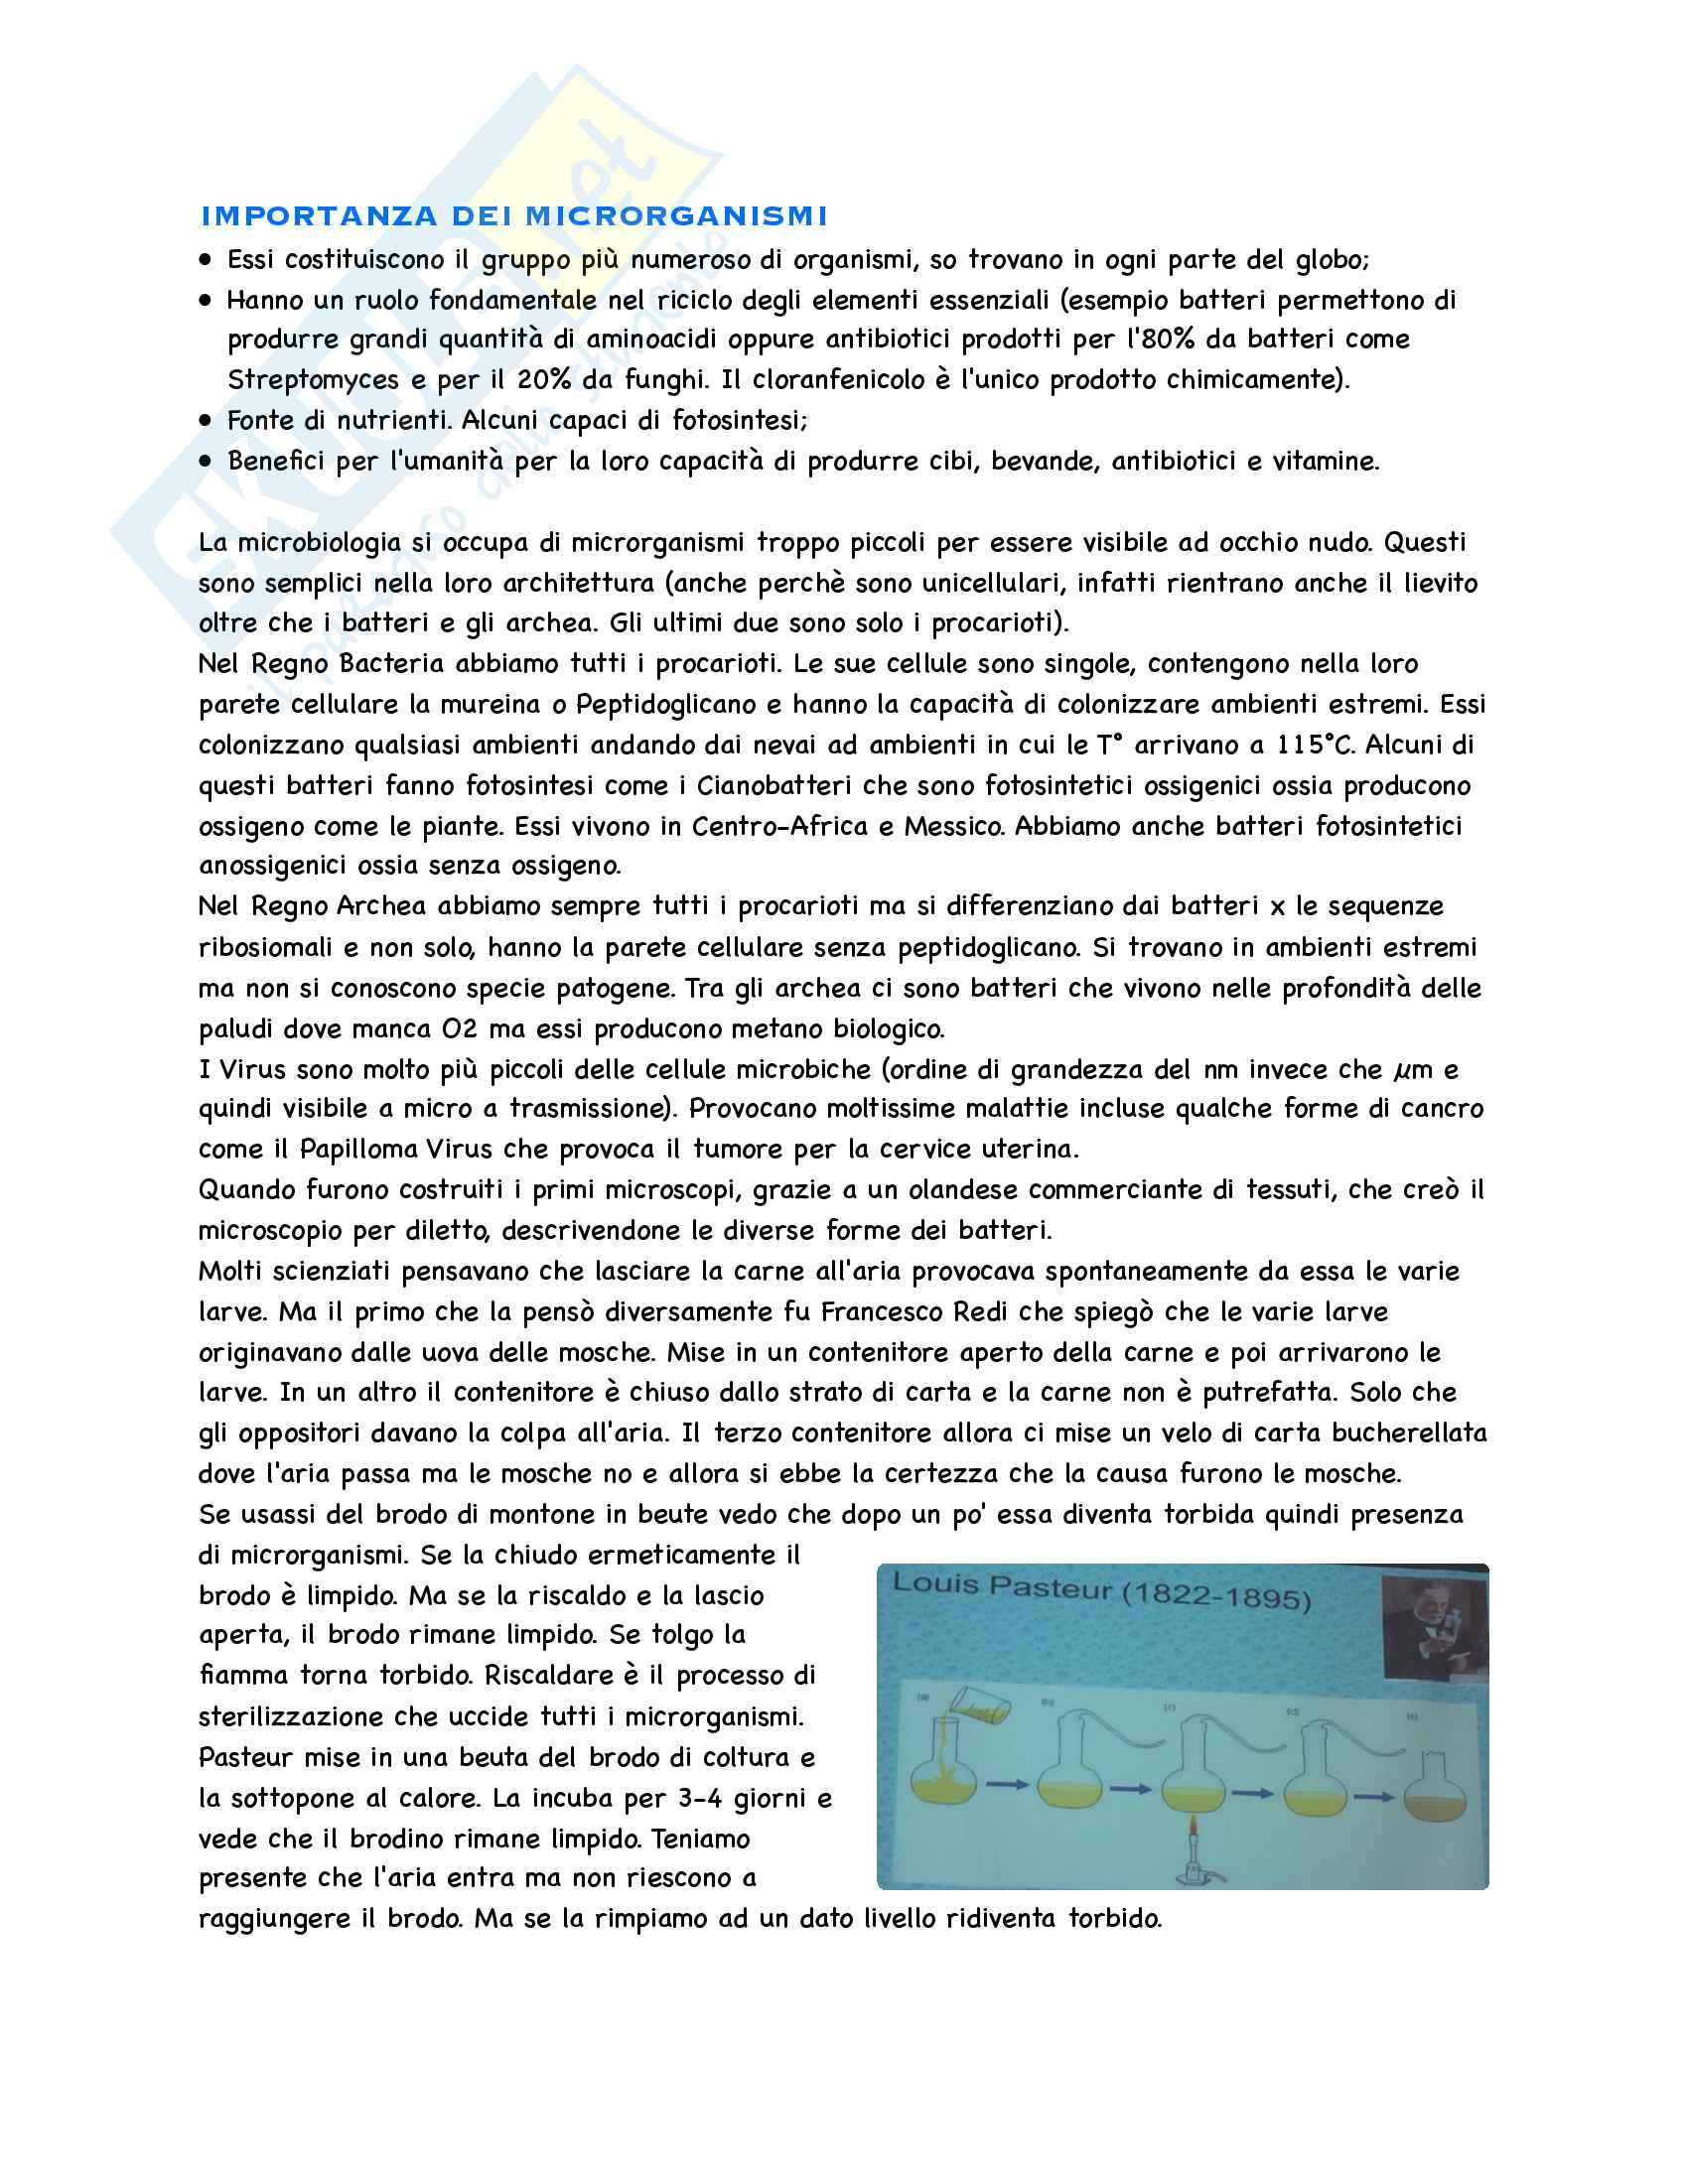 Microbiologia Appunti Parte 1 Pag. 2